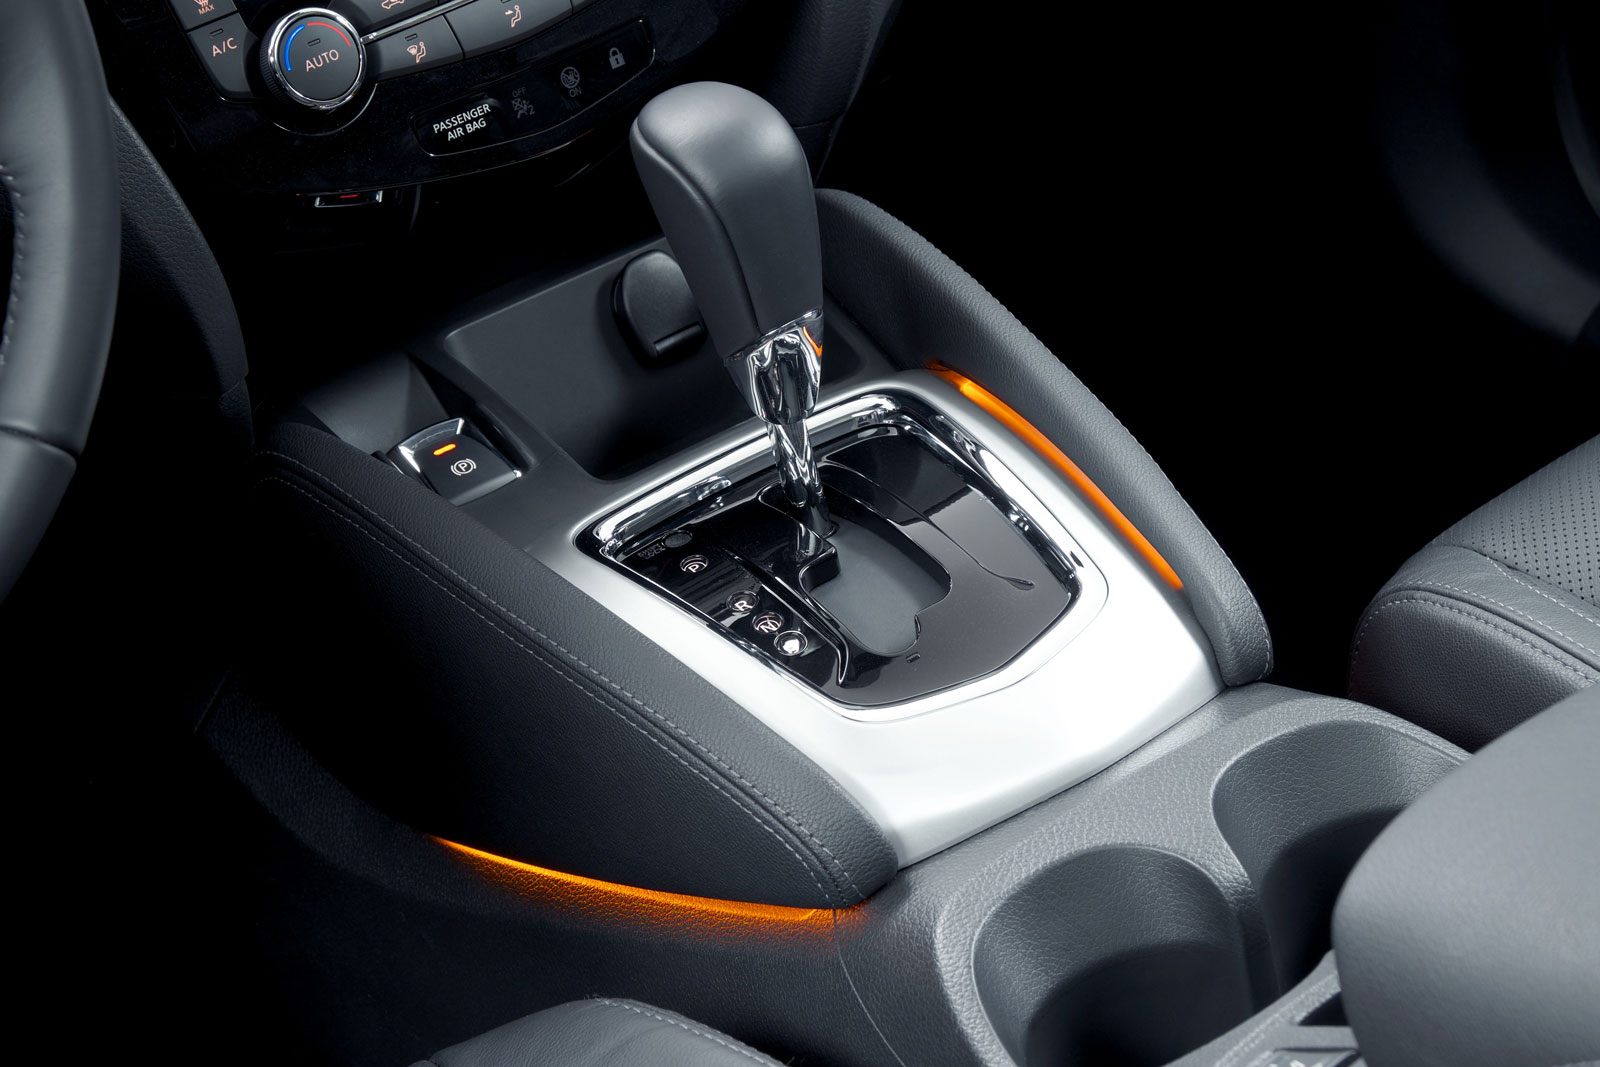 New Nissan Qashqai Interior - Car Body Design